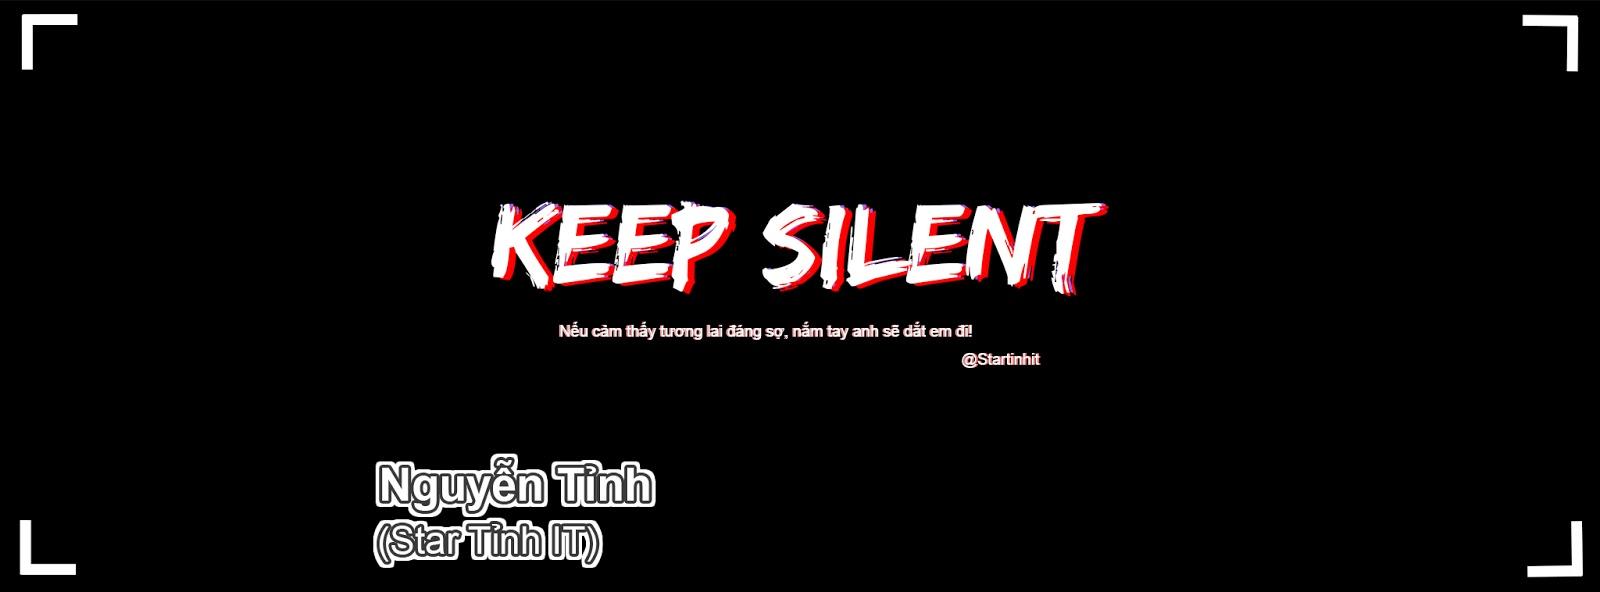 Share bìa facebook keep silent chất jpg 1600x592 Chất anh bia